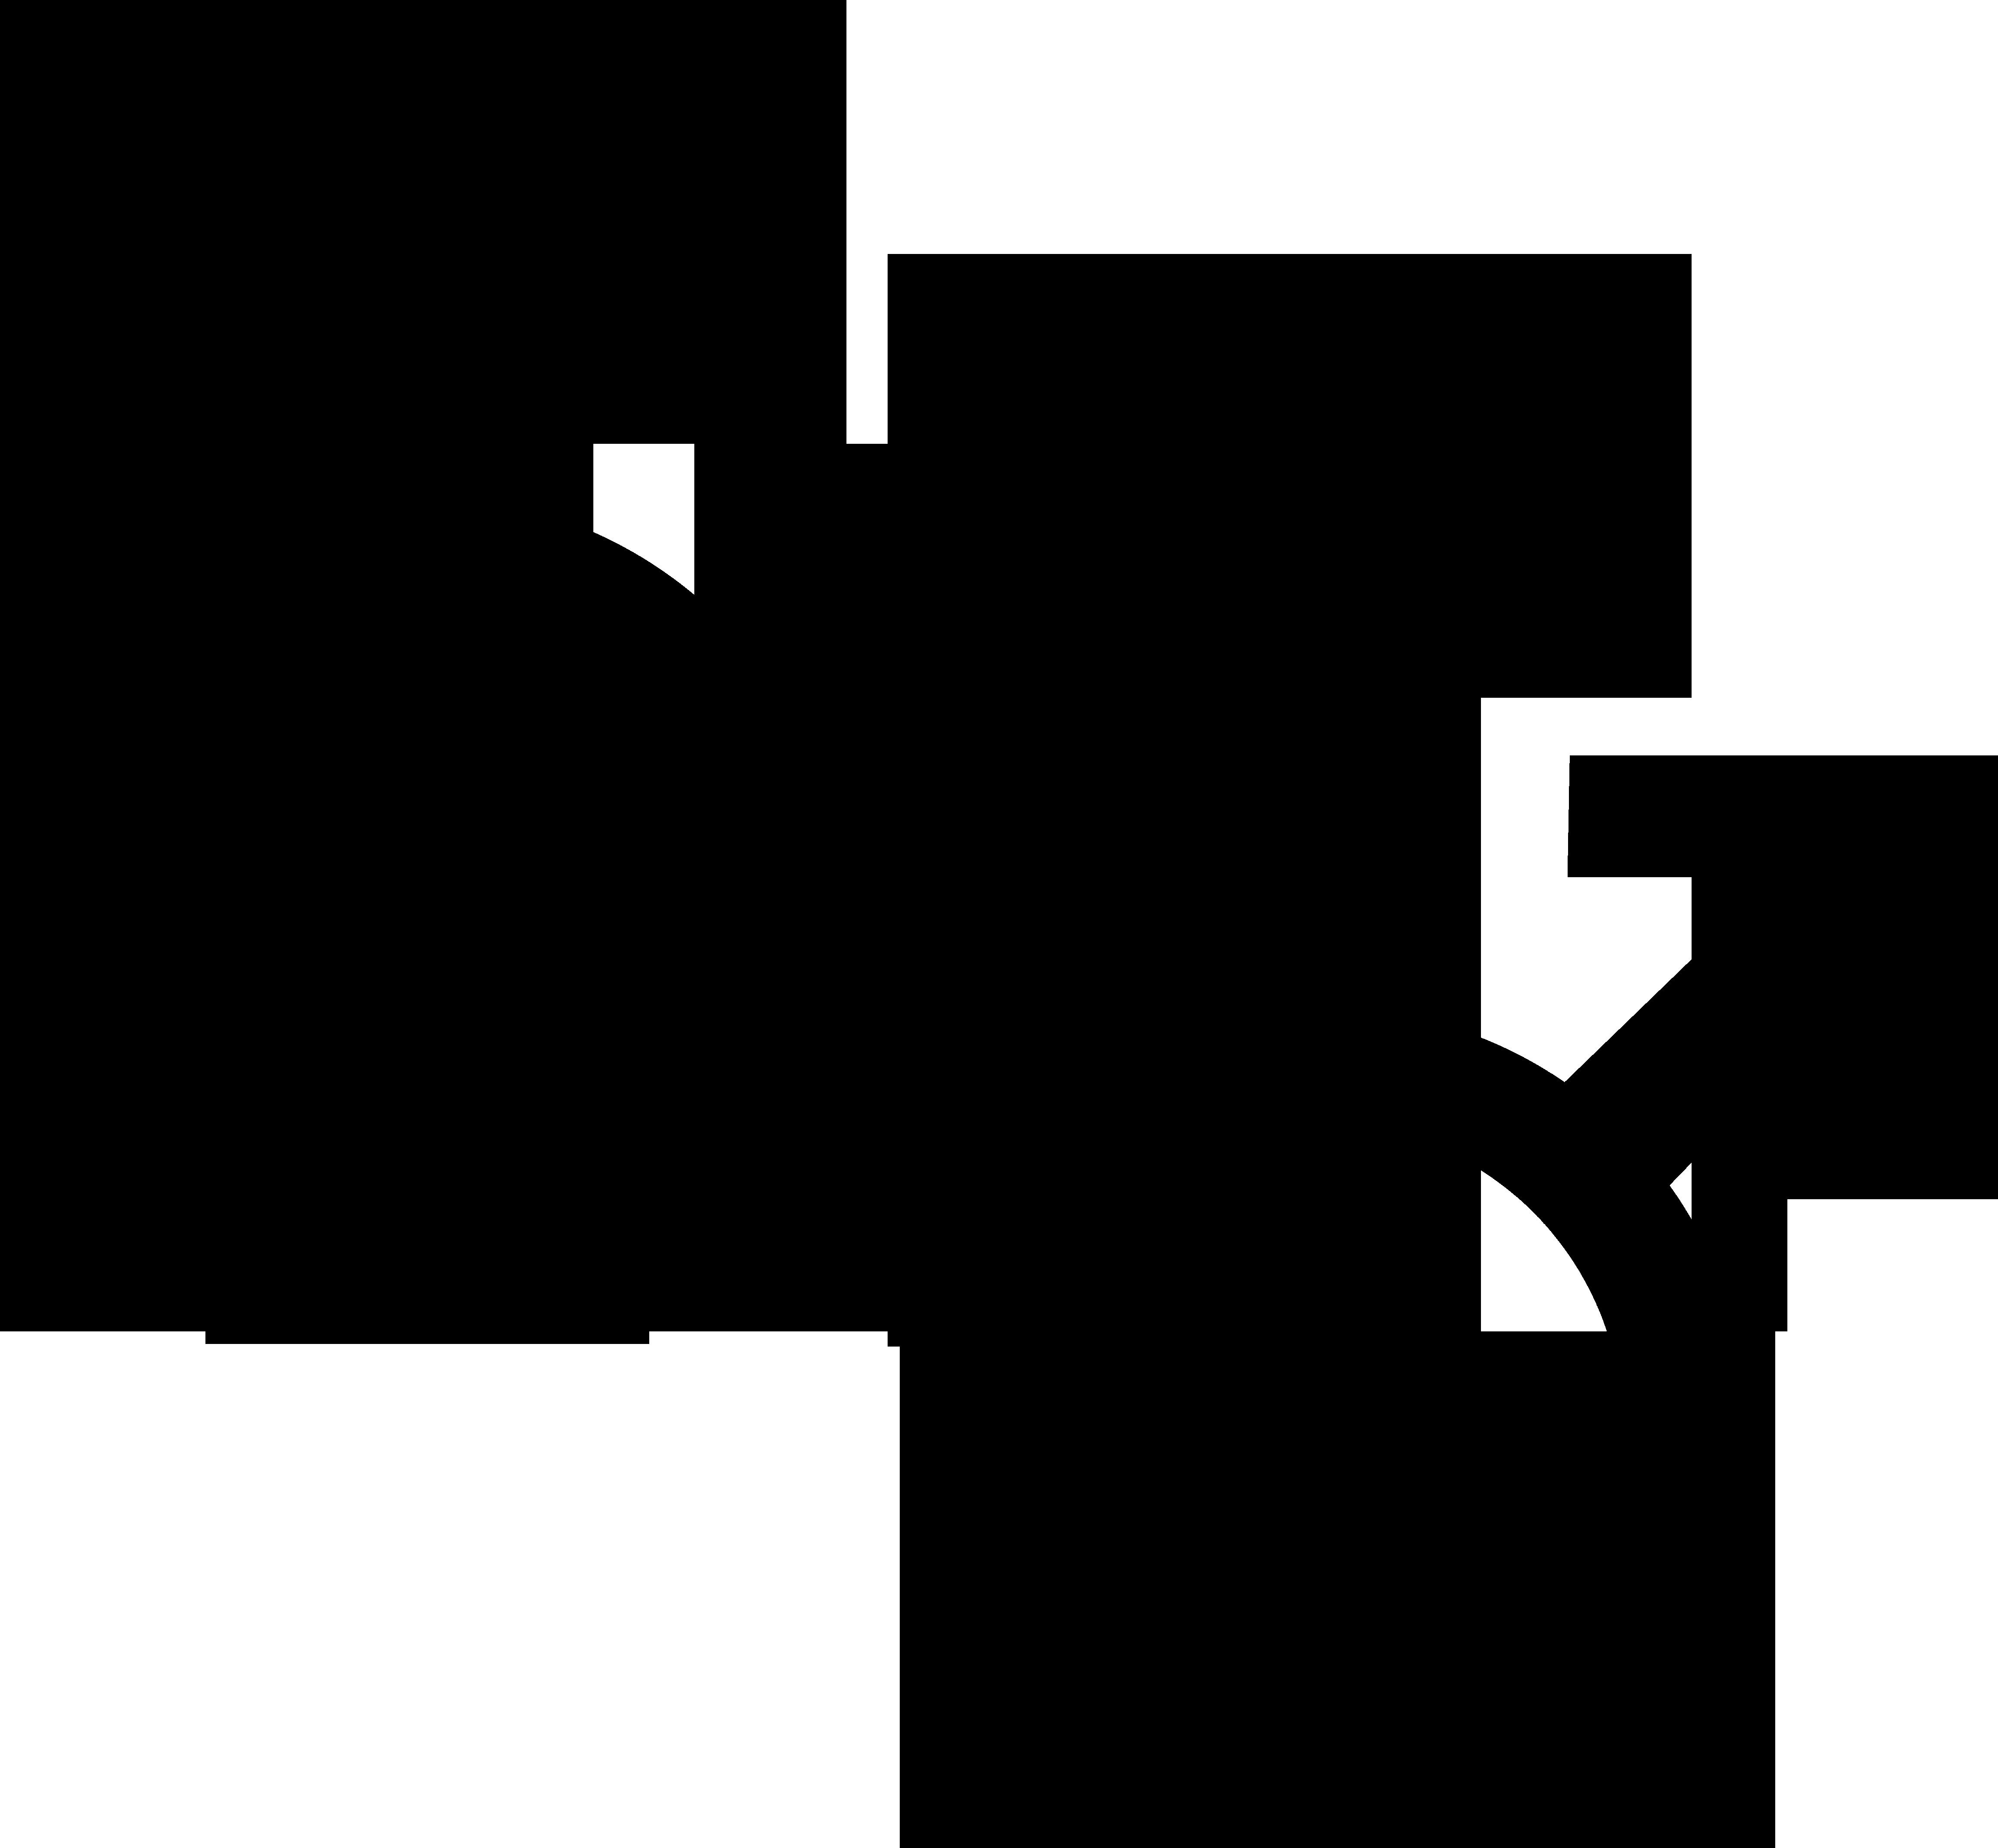 Nonbinary man symbol interlocked with nonbinary and Mars symbols.